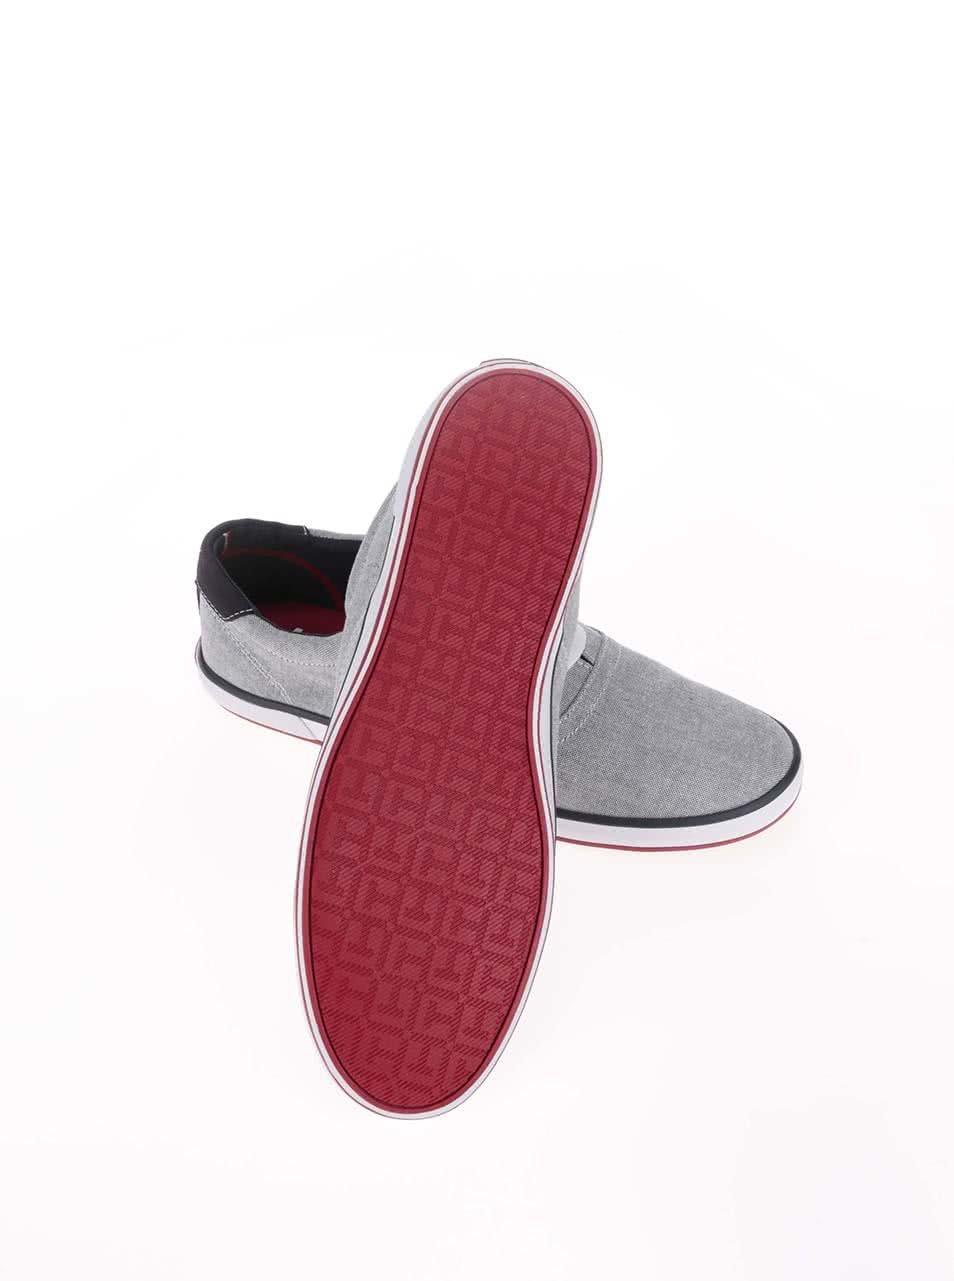 Sivé pánske tenisky s červeným detailom Tommy Hilfiger Arlow ... a5cedb67d40